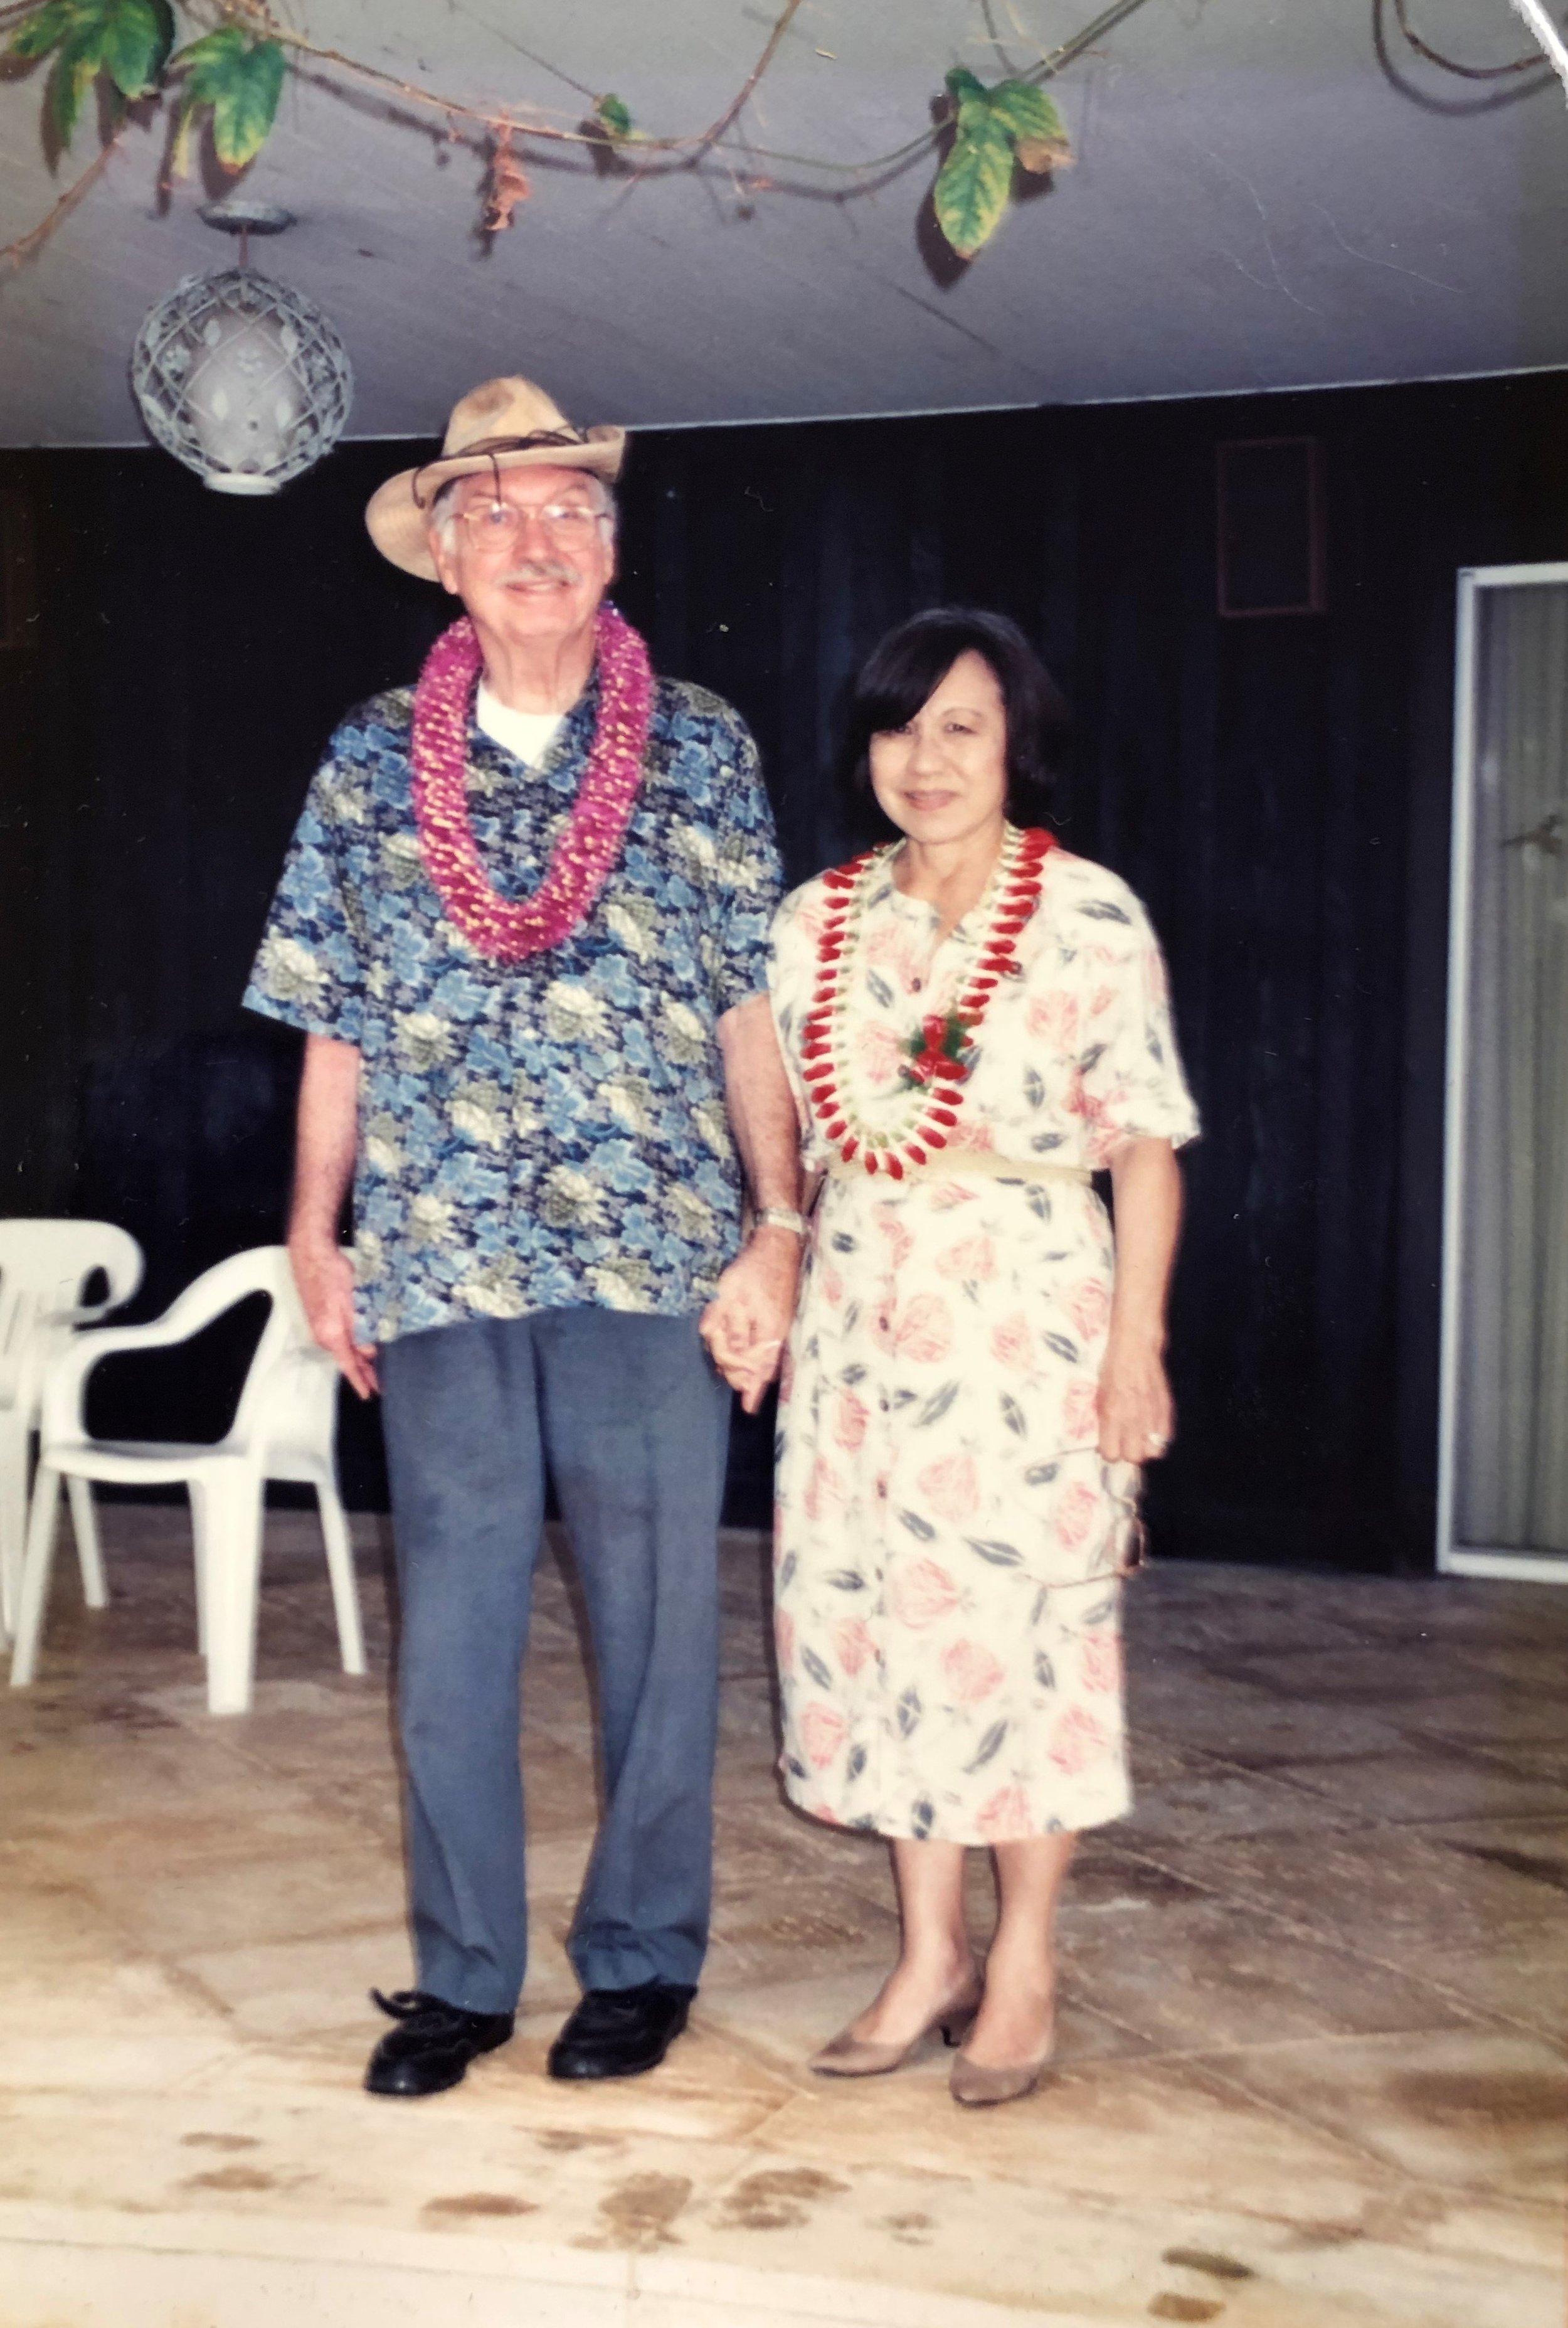 Bill and Lei Johnson